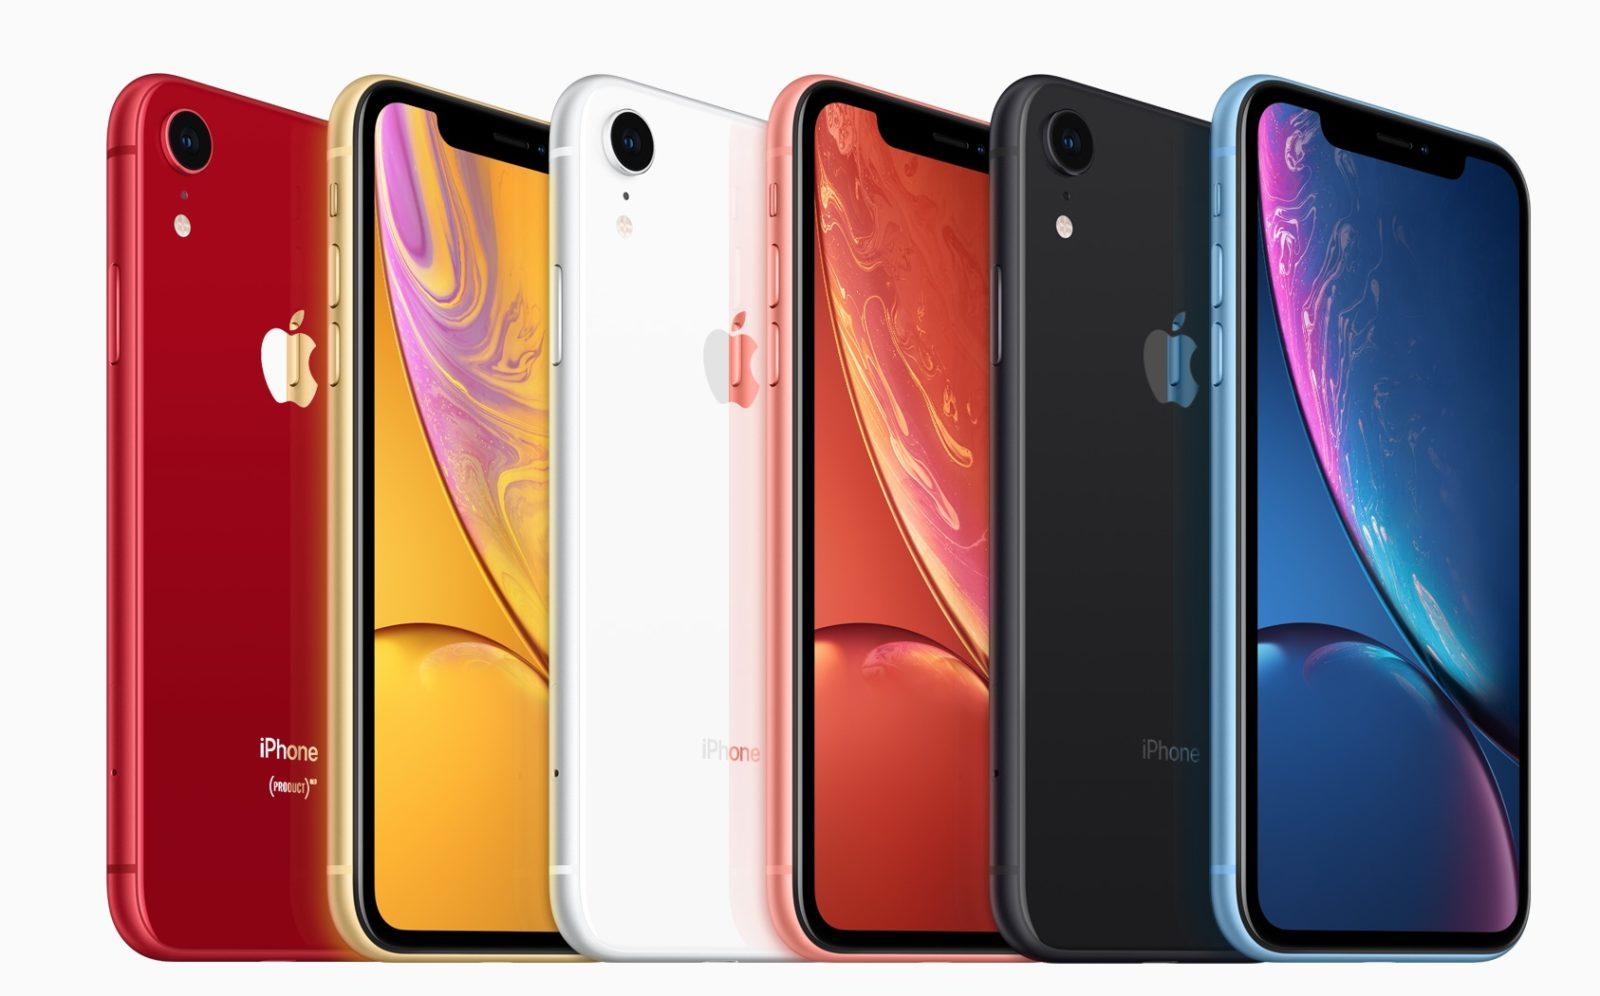 Lancio iPhone 2018, tutto su iPhone Xs, iPhone Xs Max e iPhone 9